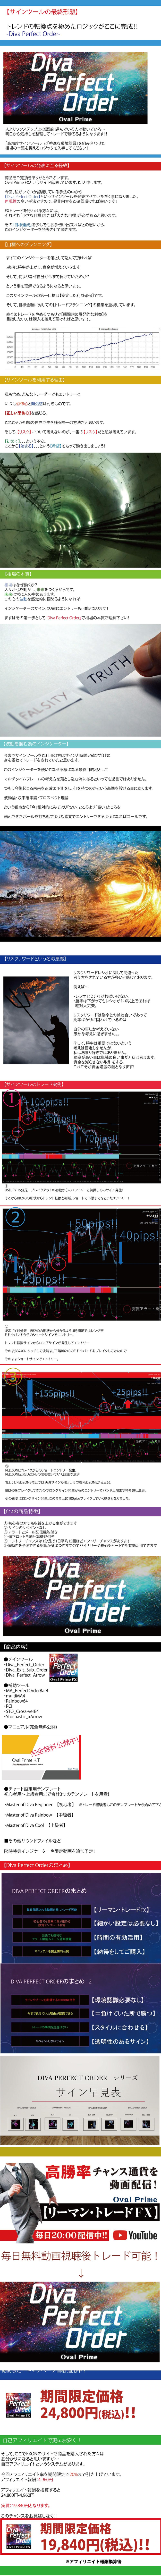 2.Diva-Perfect-<br /> <br /> Order-LP-Master.jpg